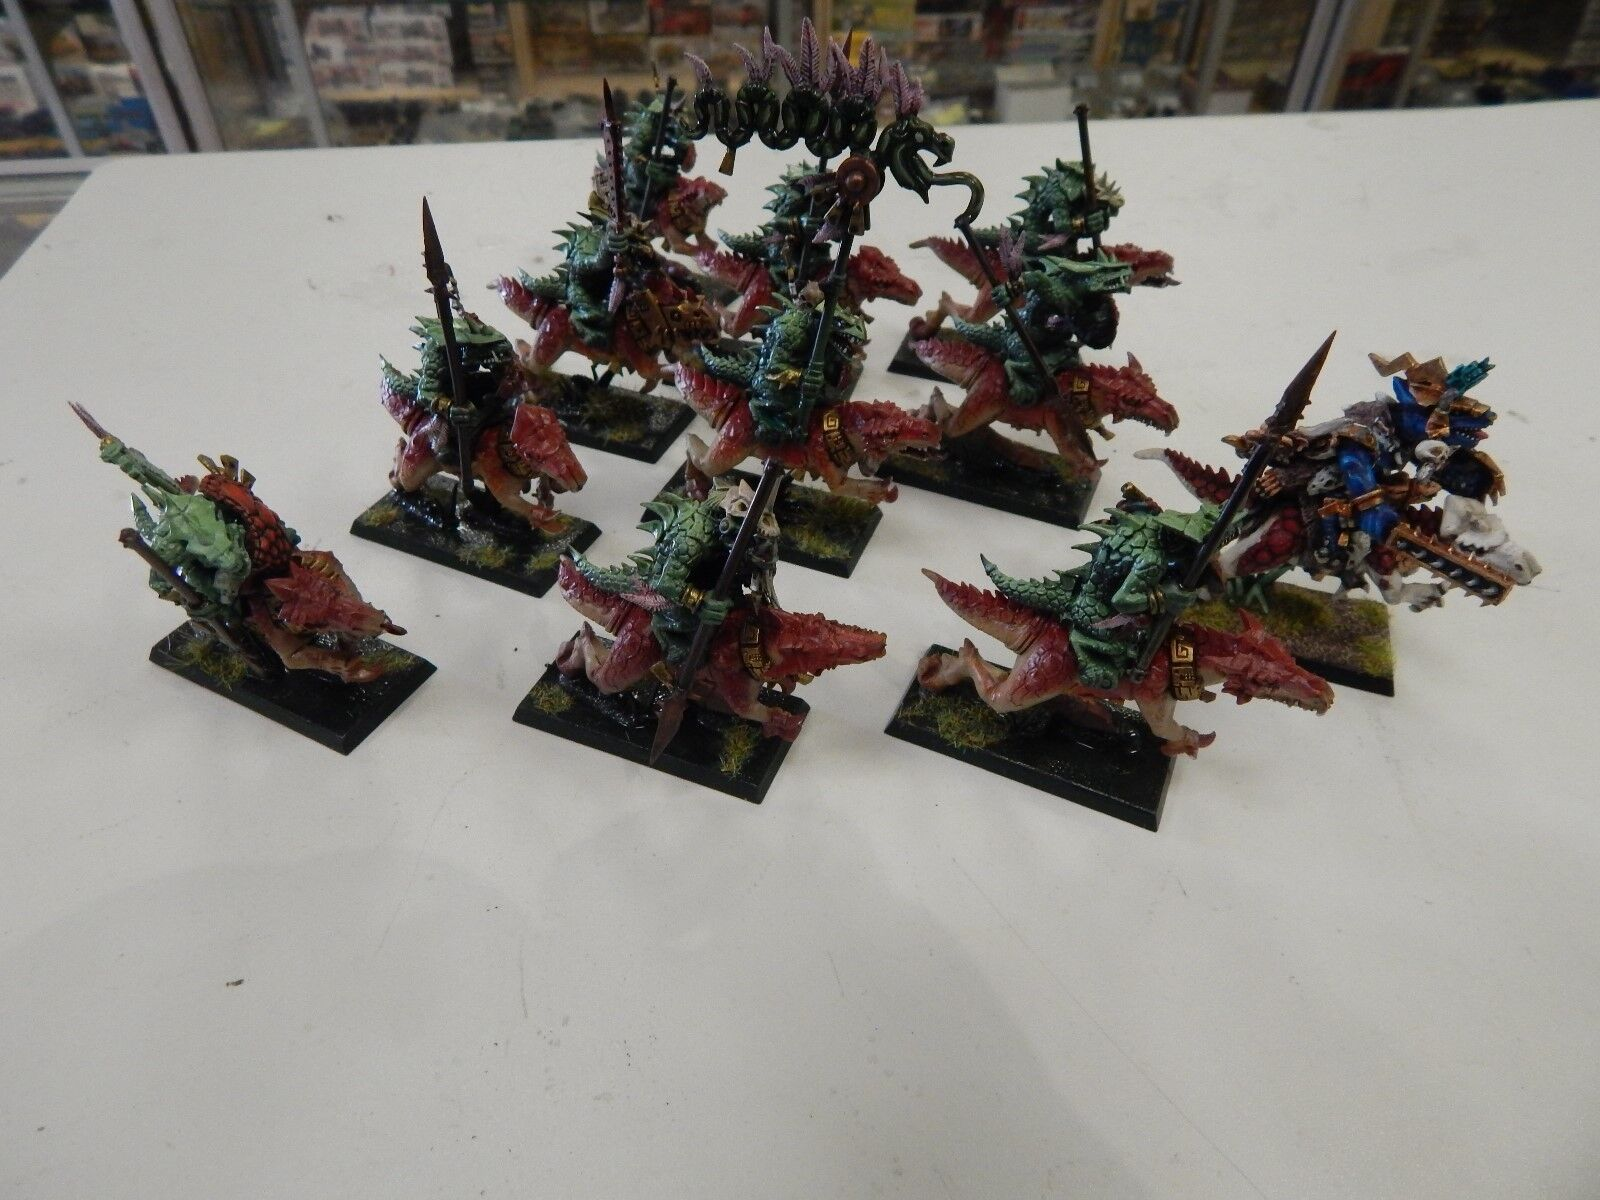 Games Workshop Warhammer Age of Sigma painted Lizardmen   Seraphon Saurus riders